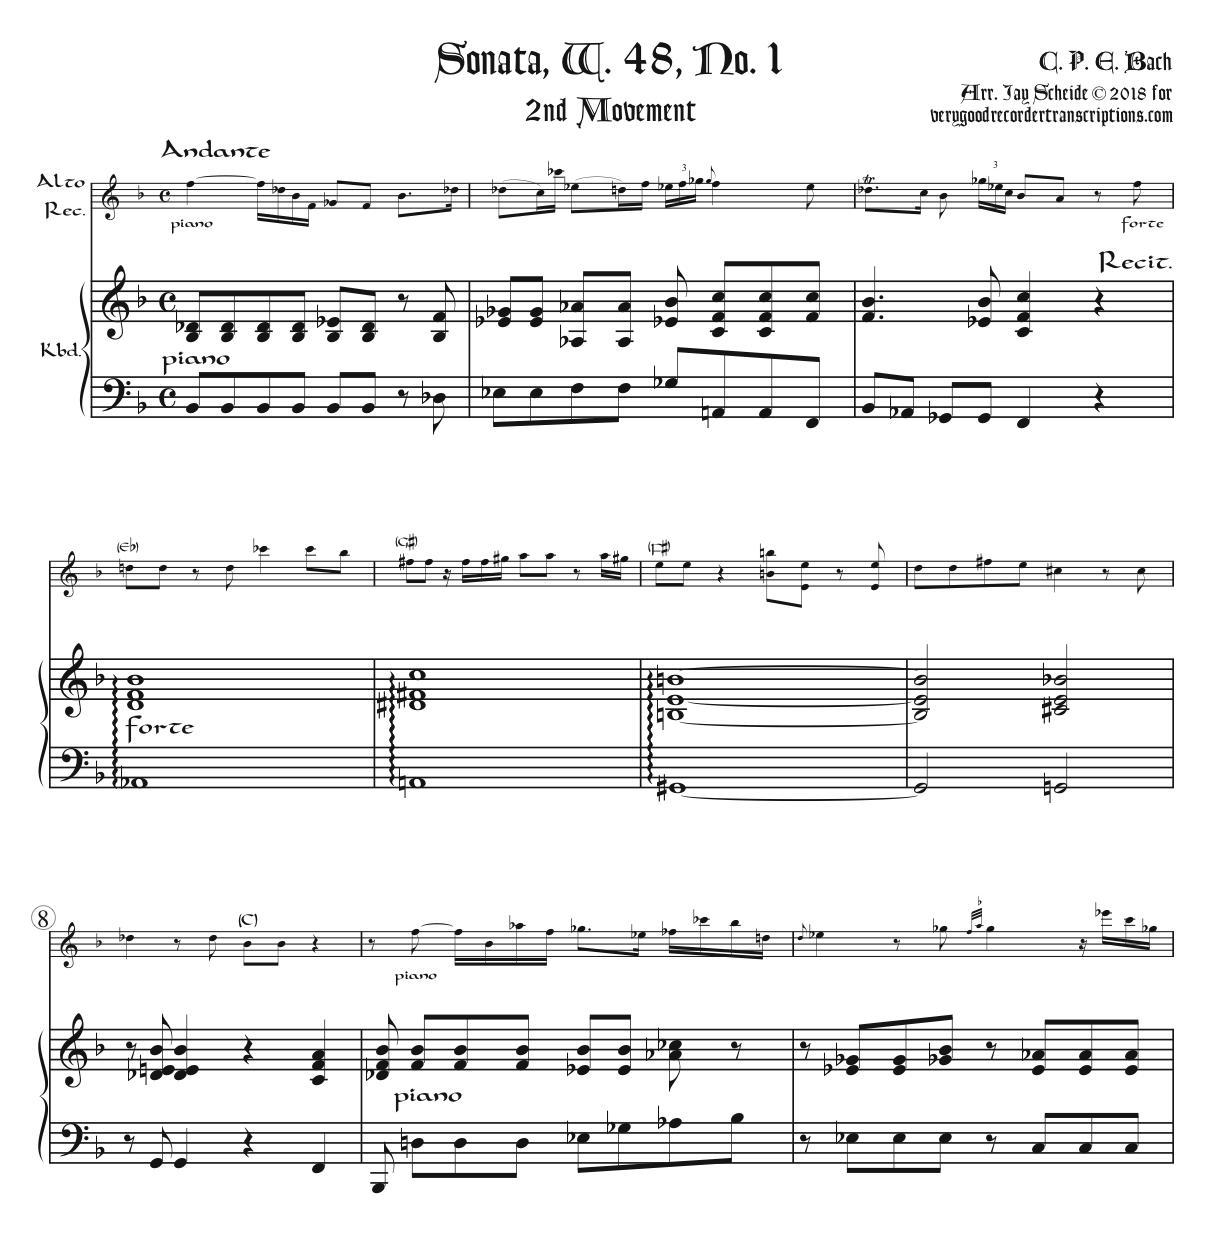 Andante from Sonata, H. 24, Wq. 48, No. 1